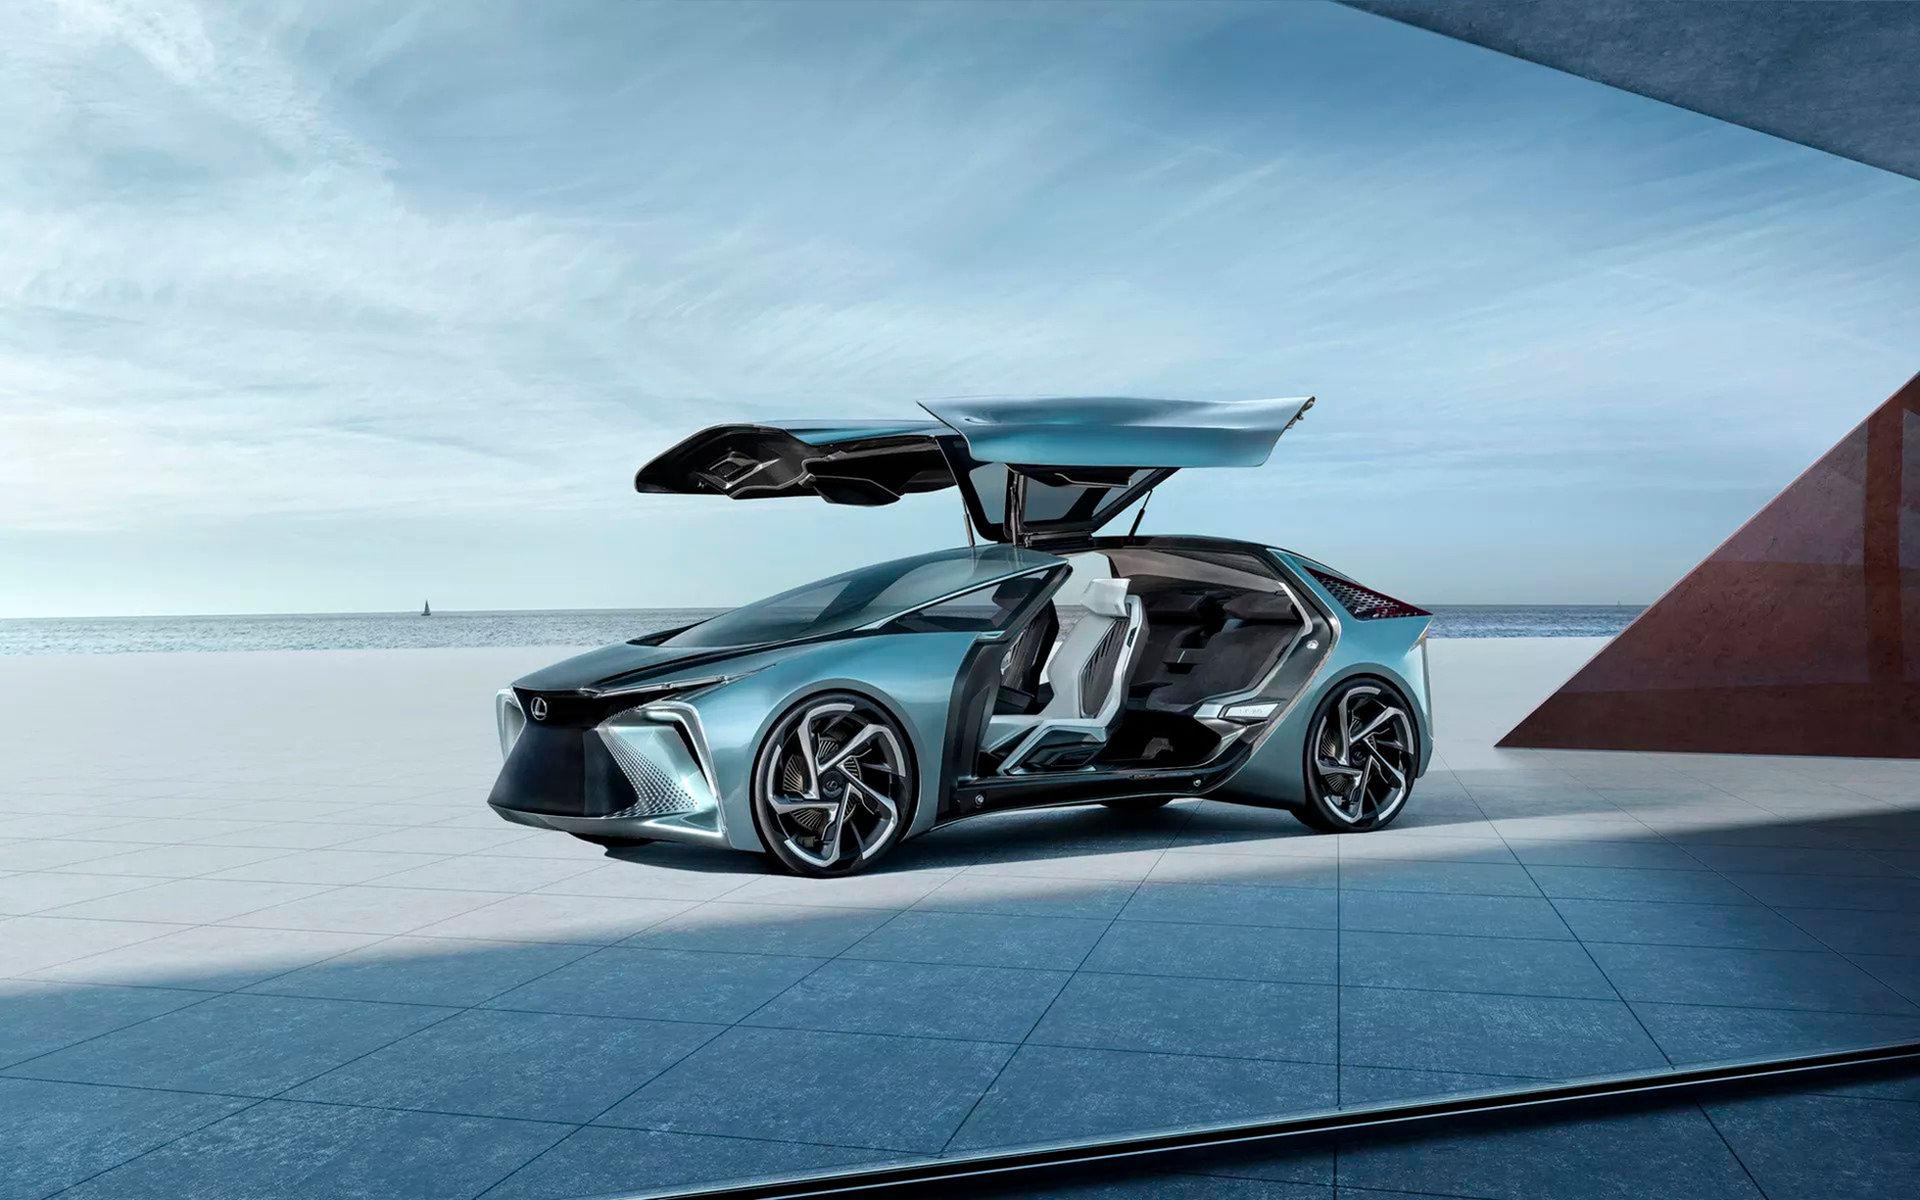 Lexus presenterar elbilskonceptet LF-30